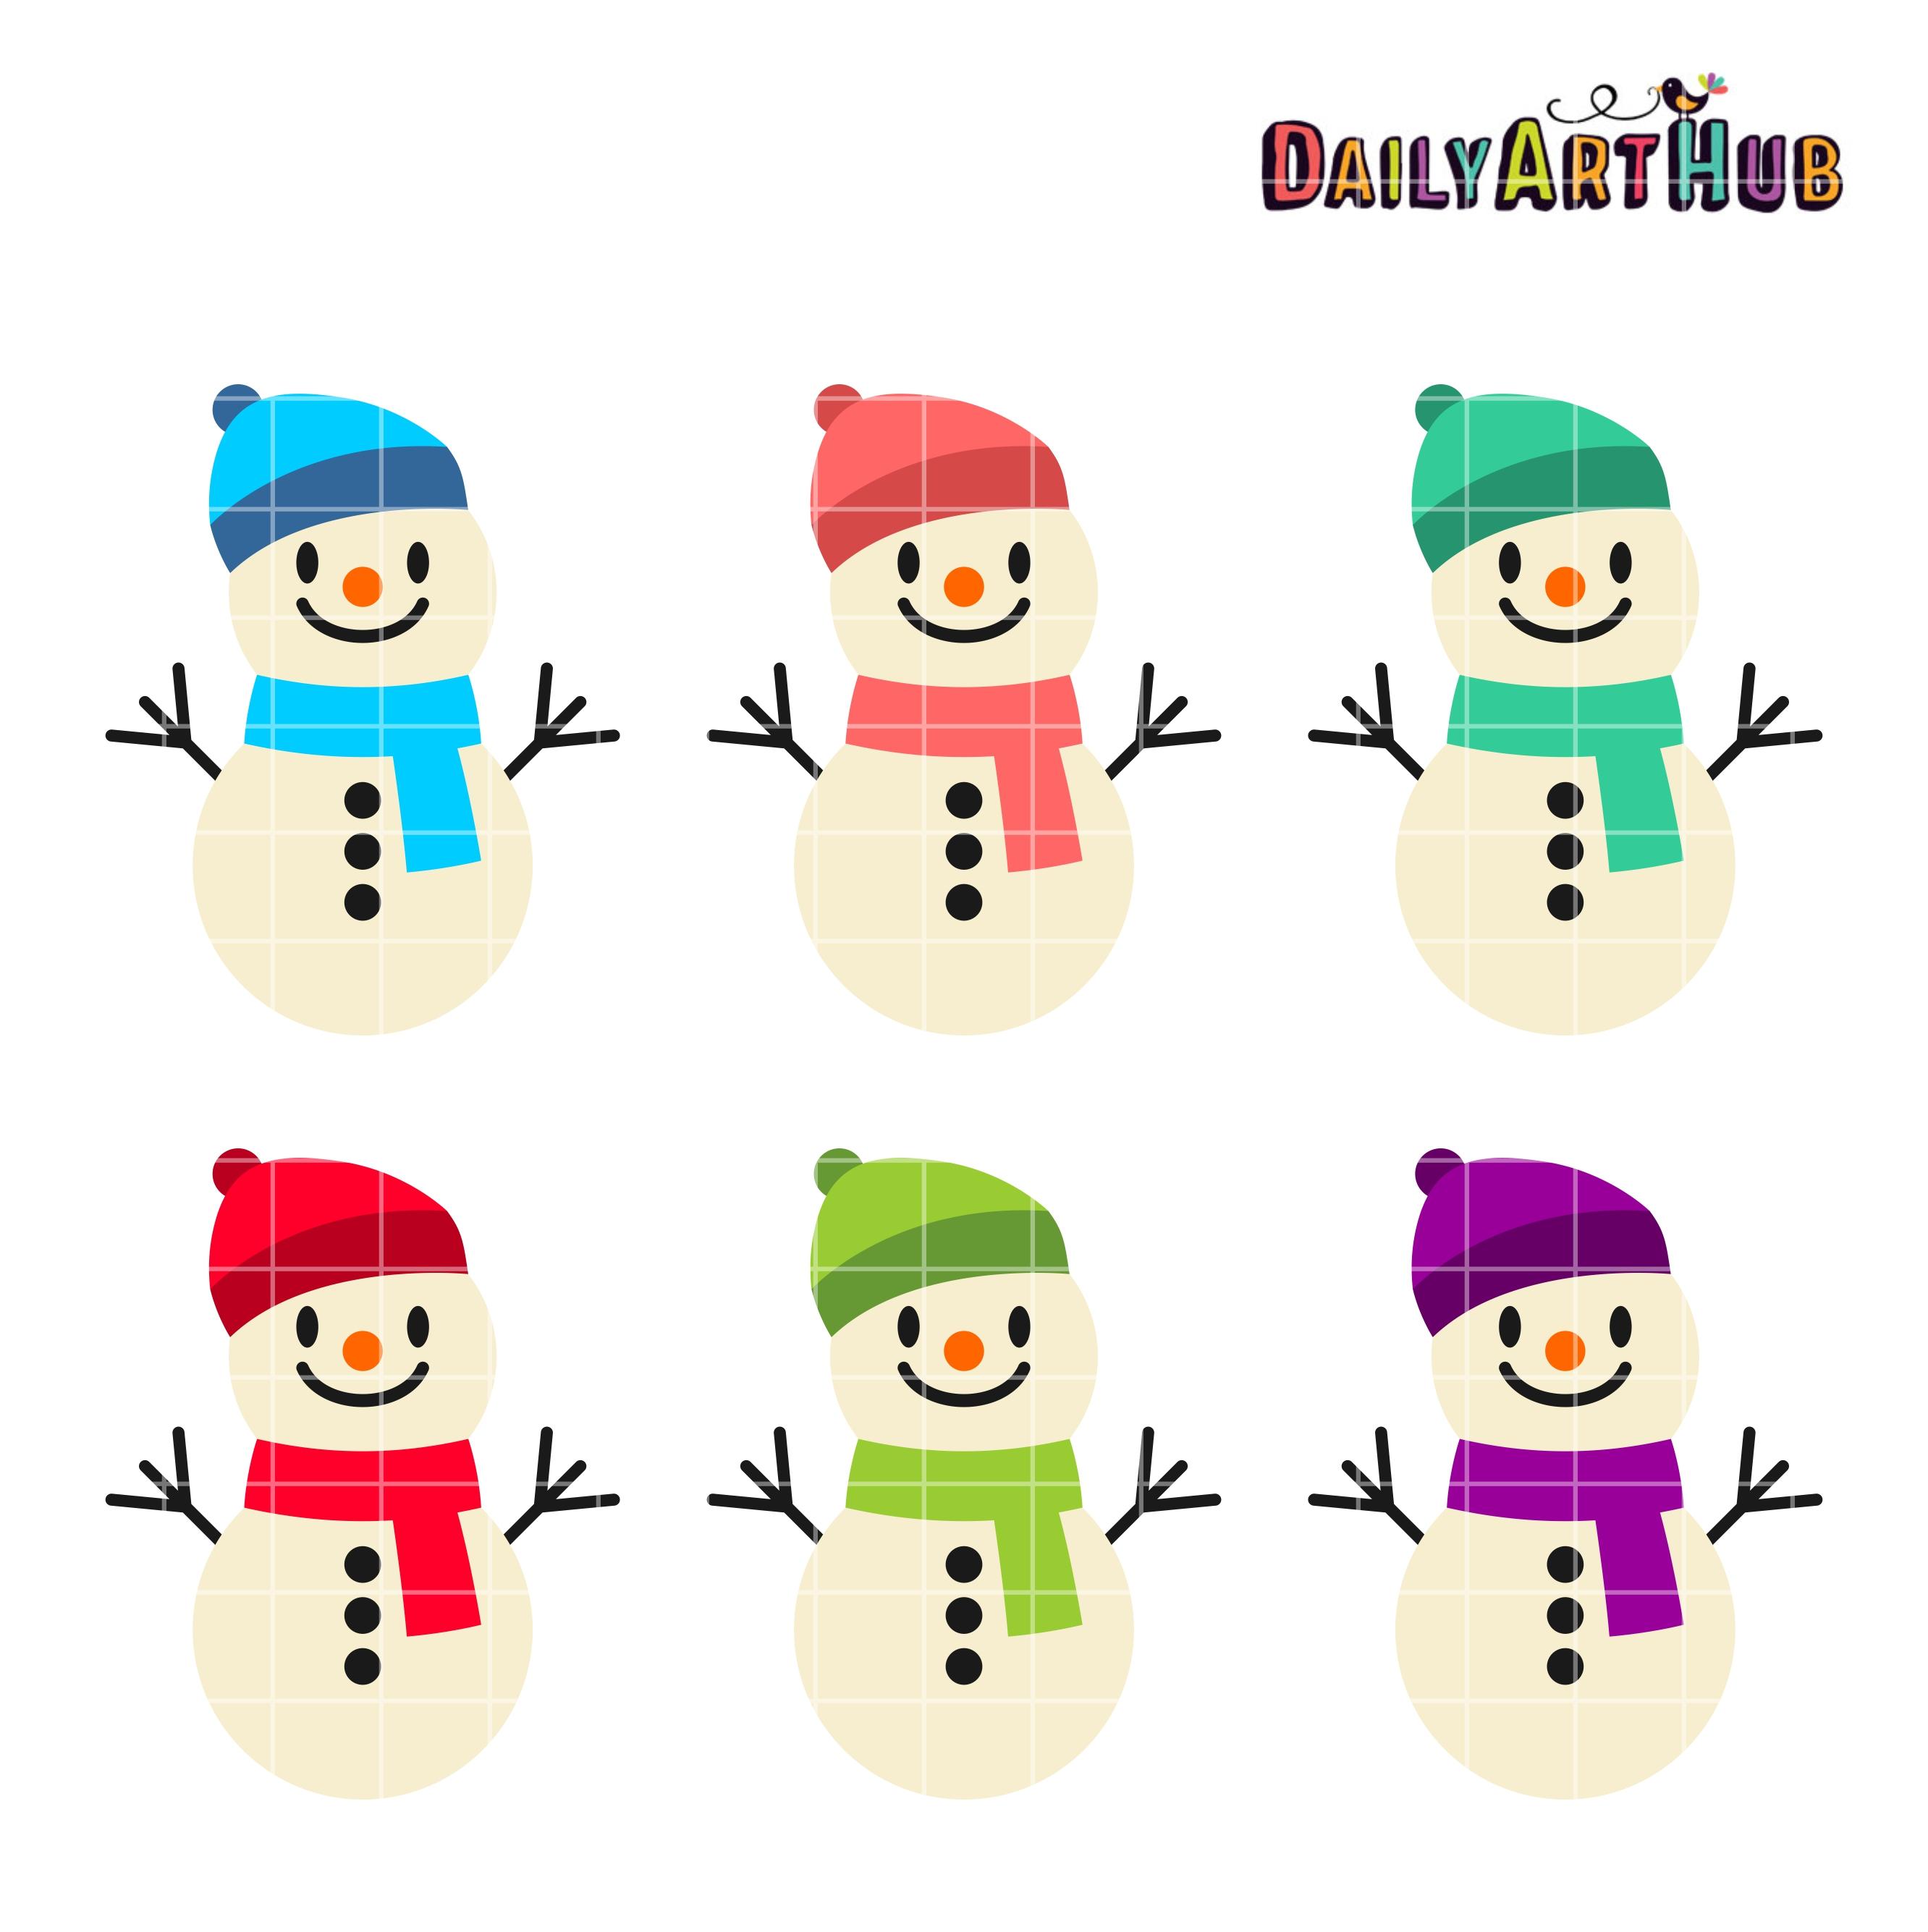 funny cute snowmen clip art set daily art hub free clip art everyday rh dailyarthub com snowman clipart black and white snowman clipart to print